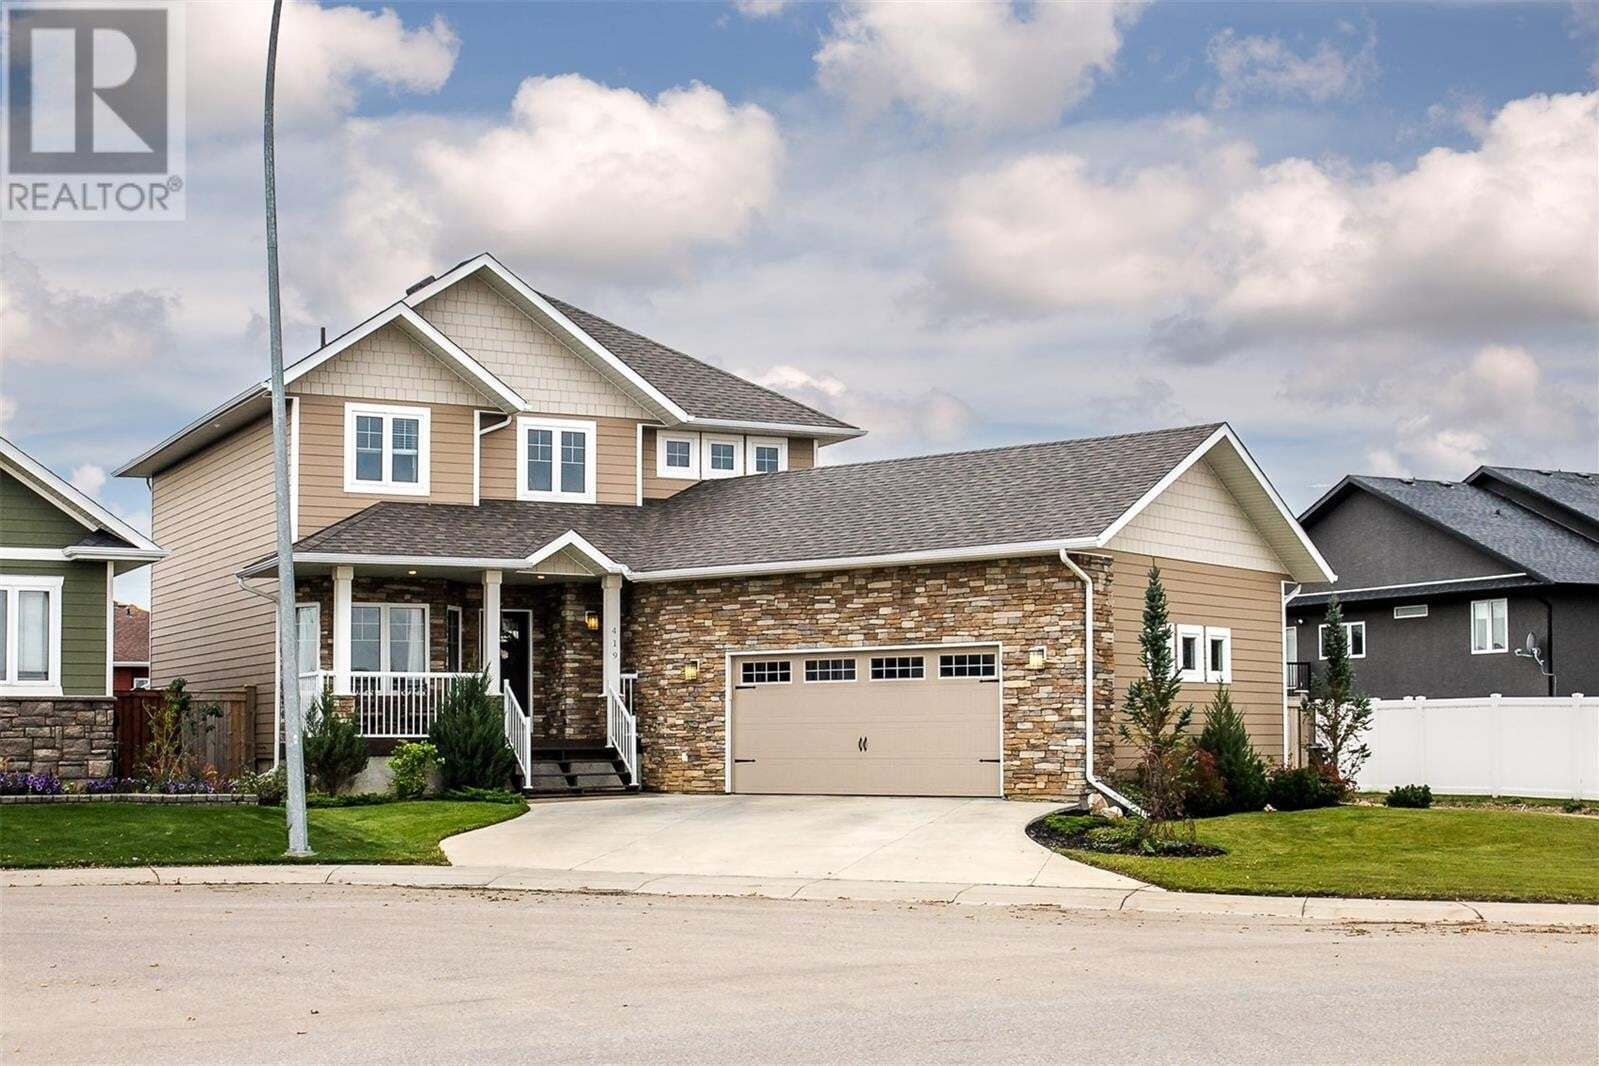 House for sale at 419 Clubhouse Blvd Warman Saskatchewan - MLS: SK810159